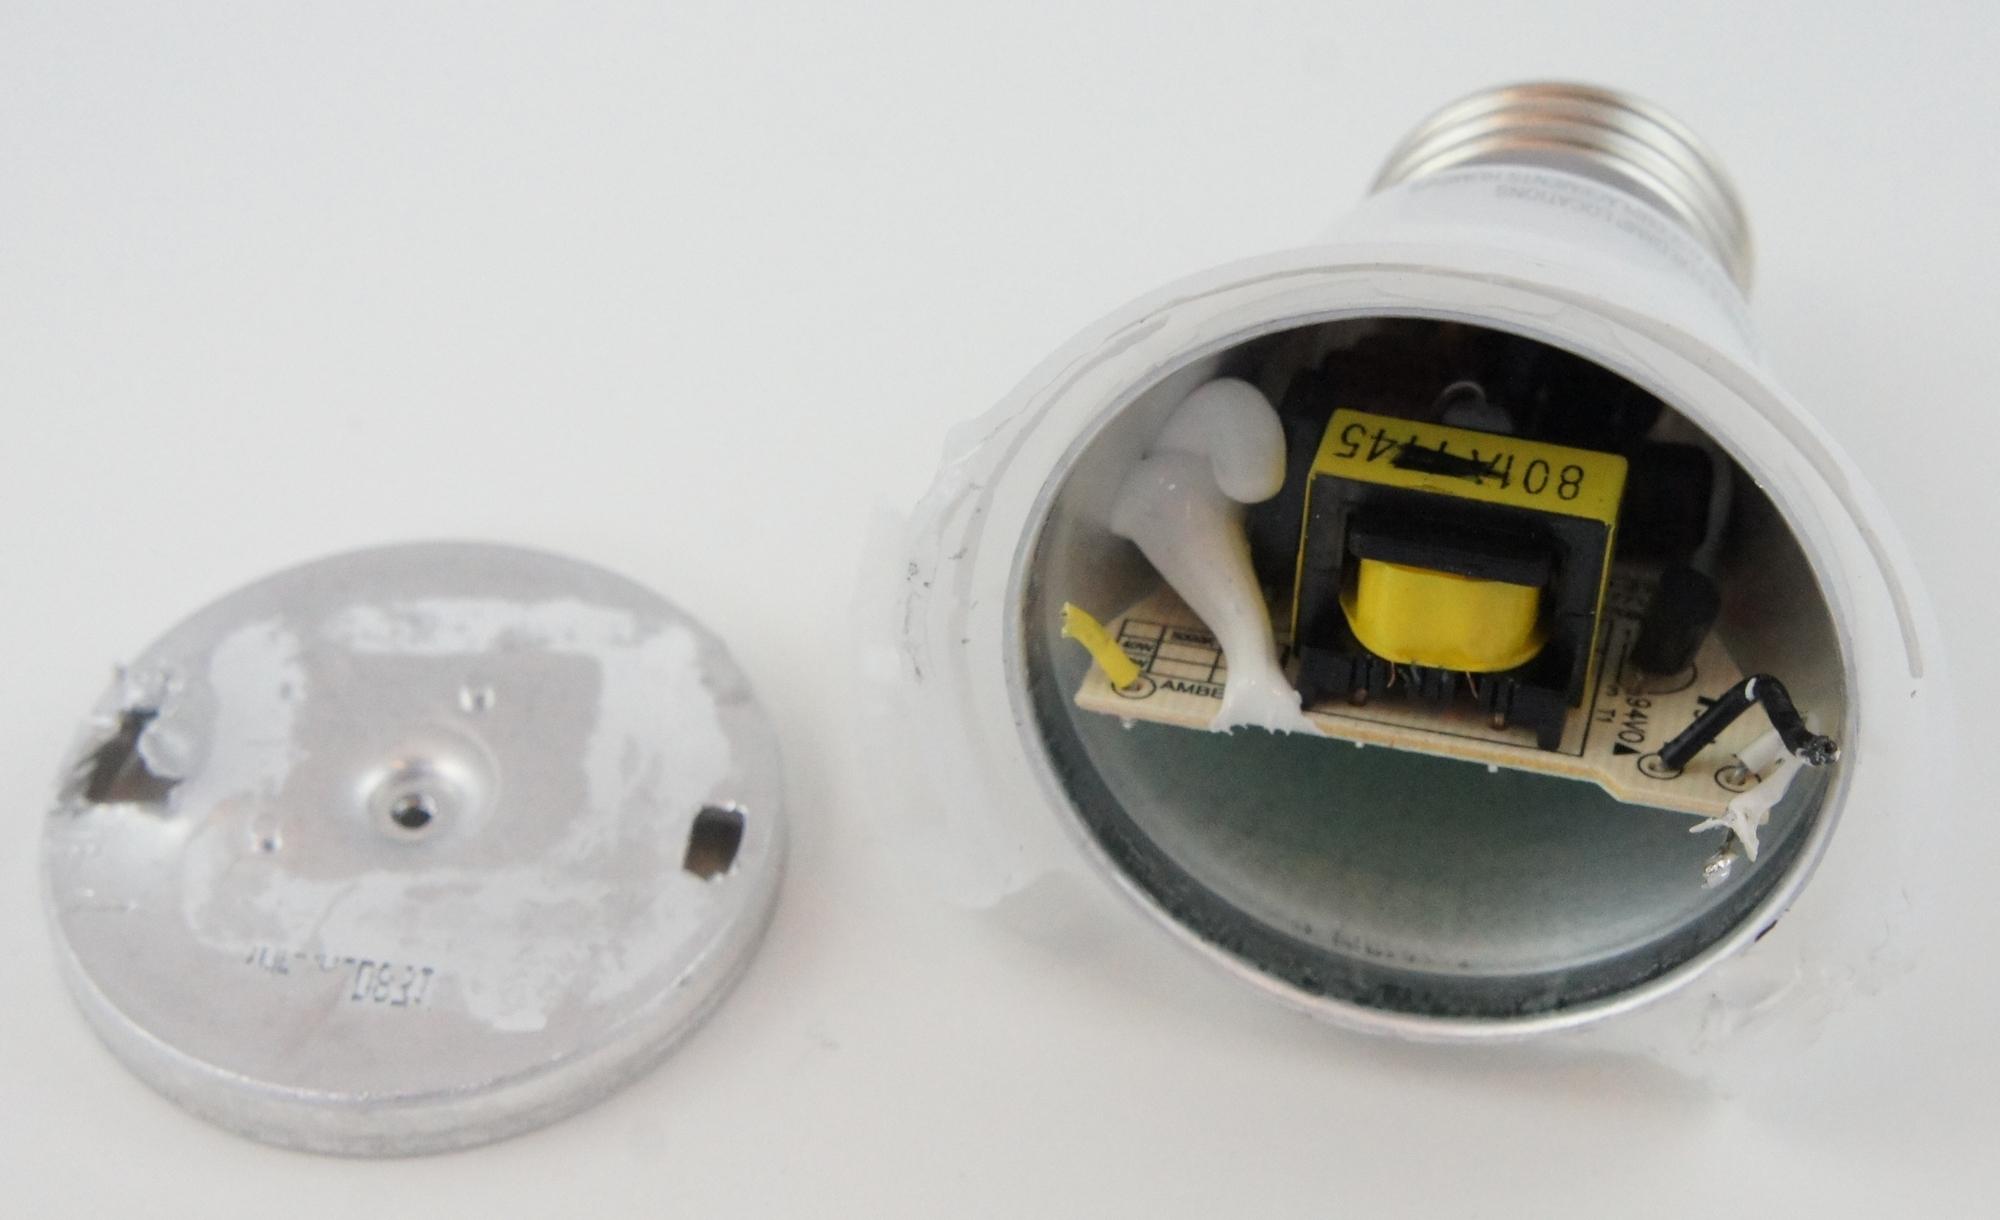 The Race to the Bottom: LED Bulbs and DFM - News - SparkFun Electronics